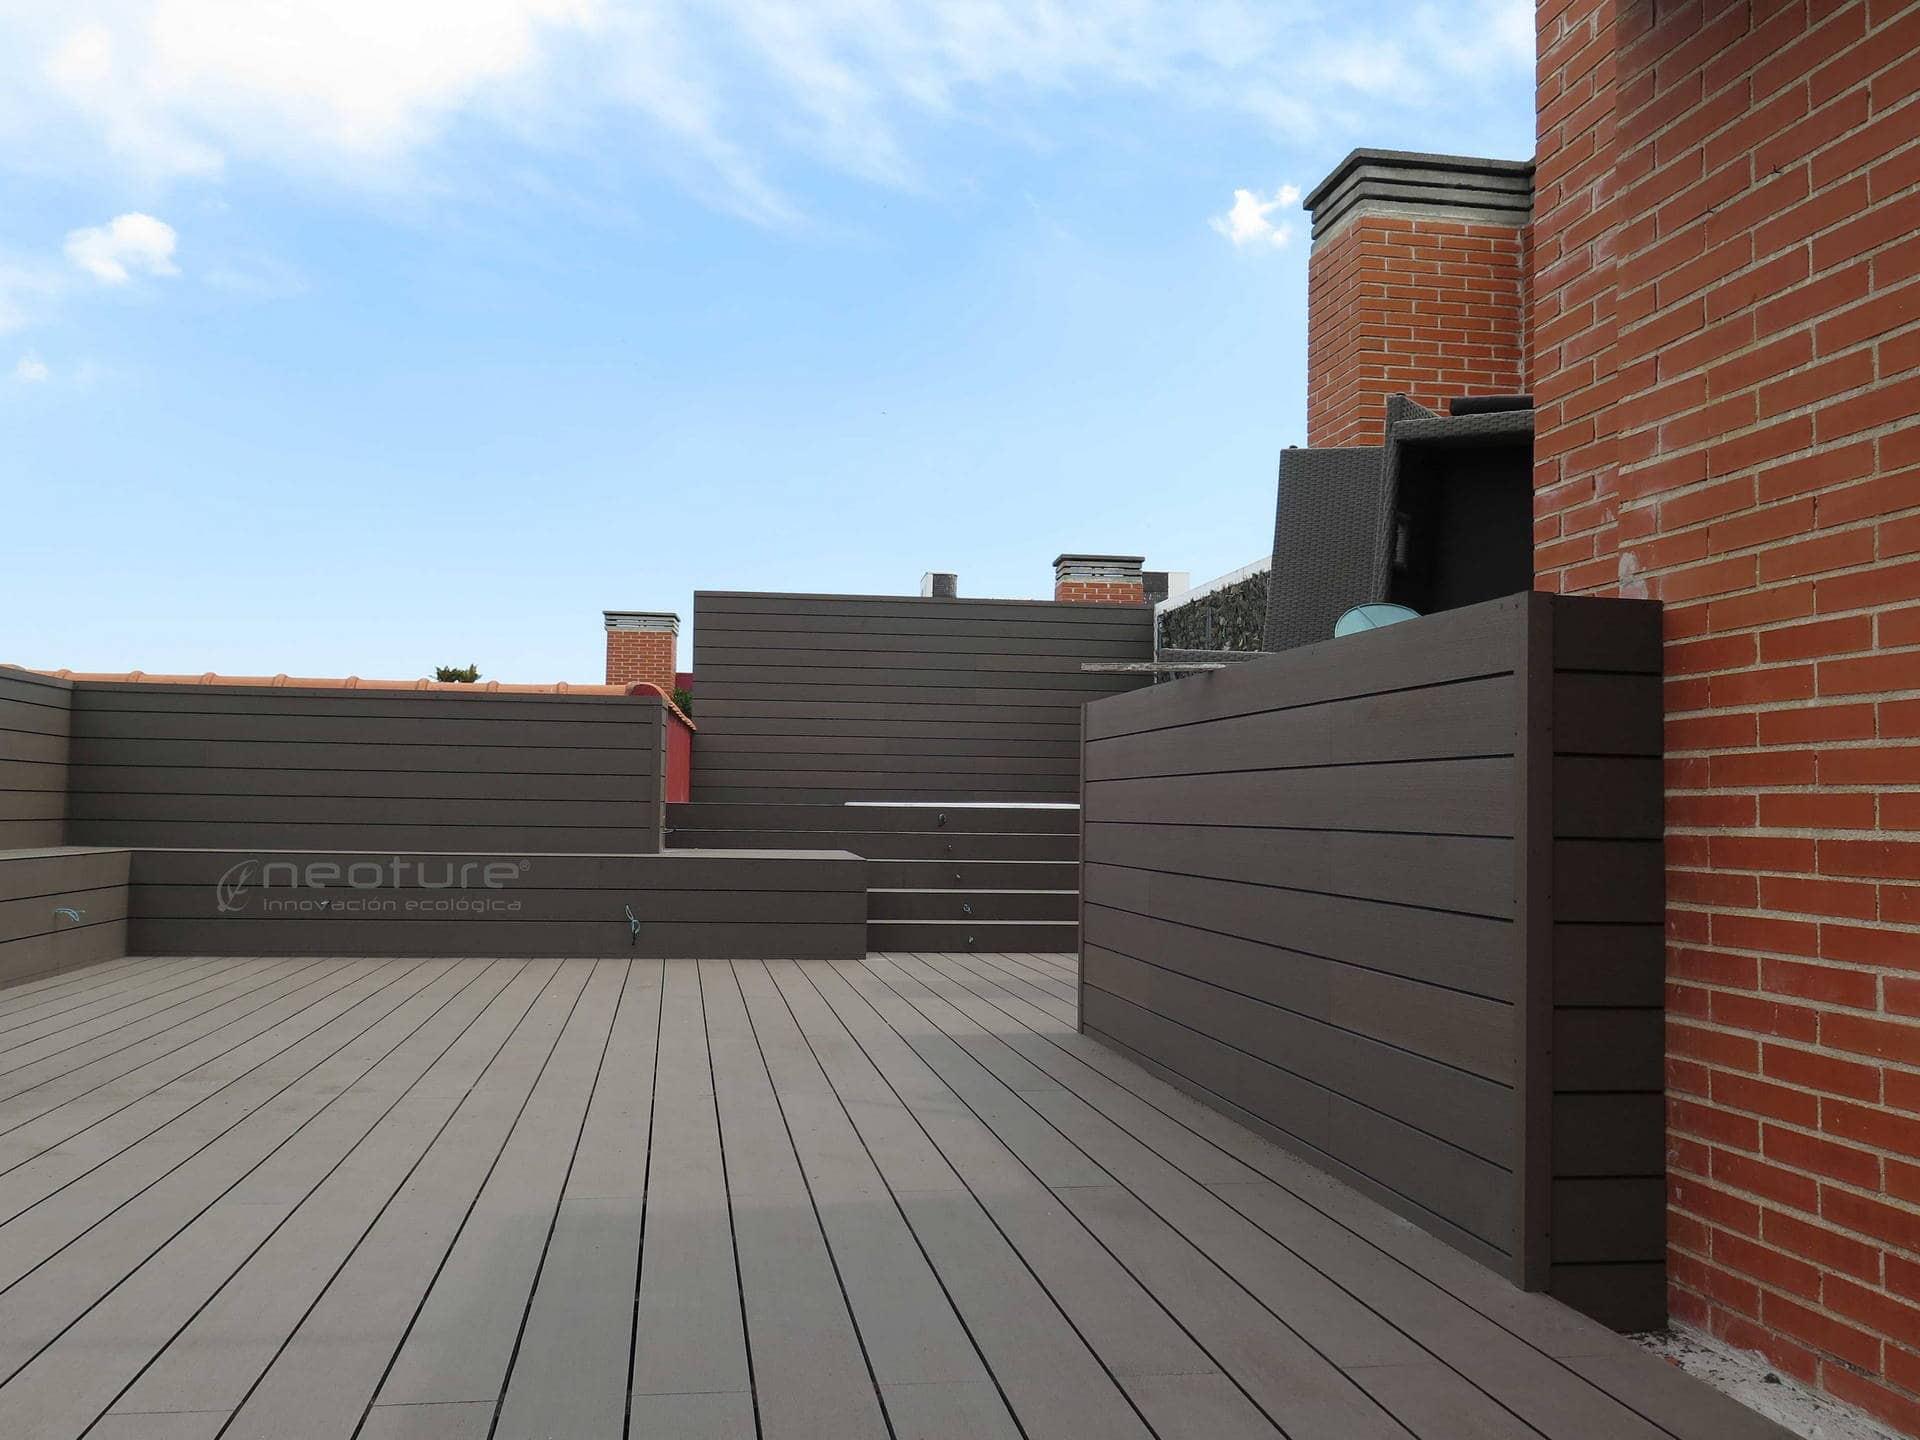 Suelos terrazas exteriores baratos great suelos para for Azulejos para terraza baratos